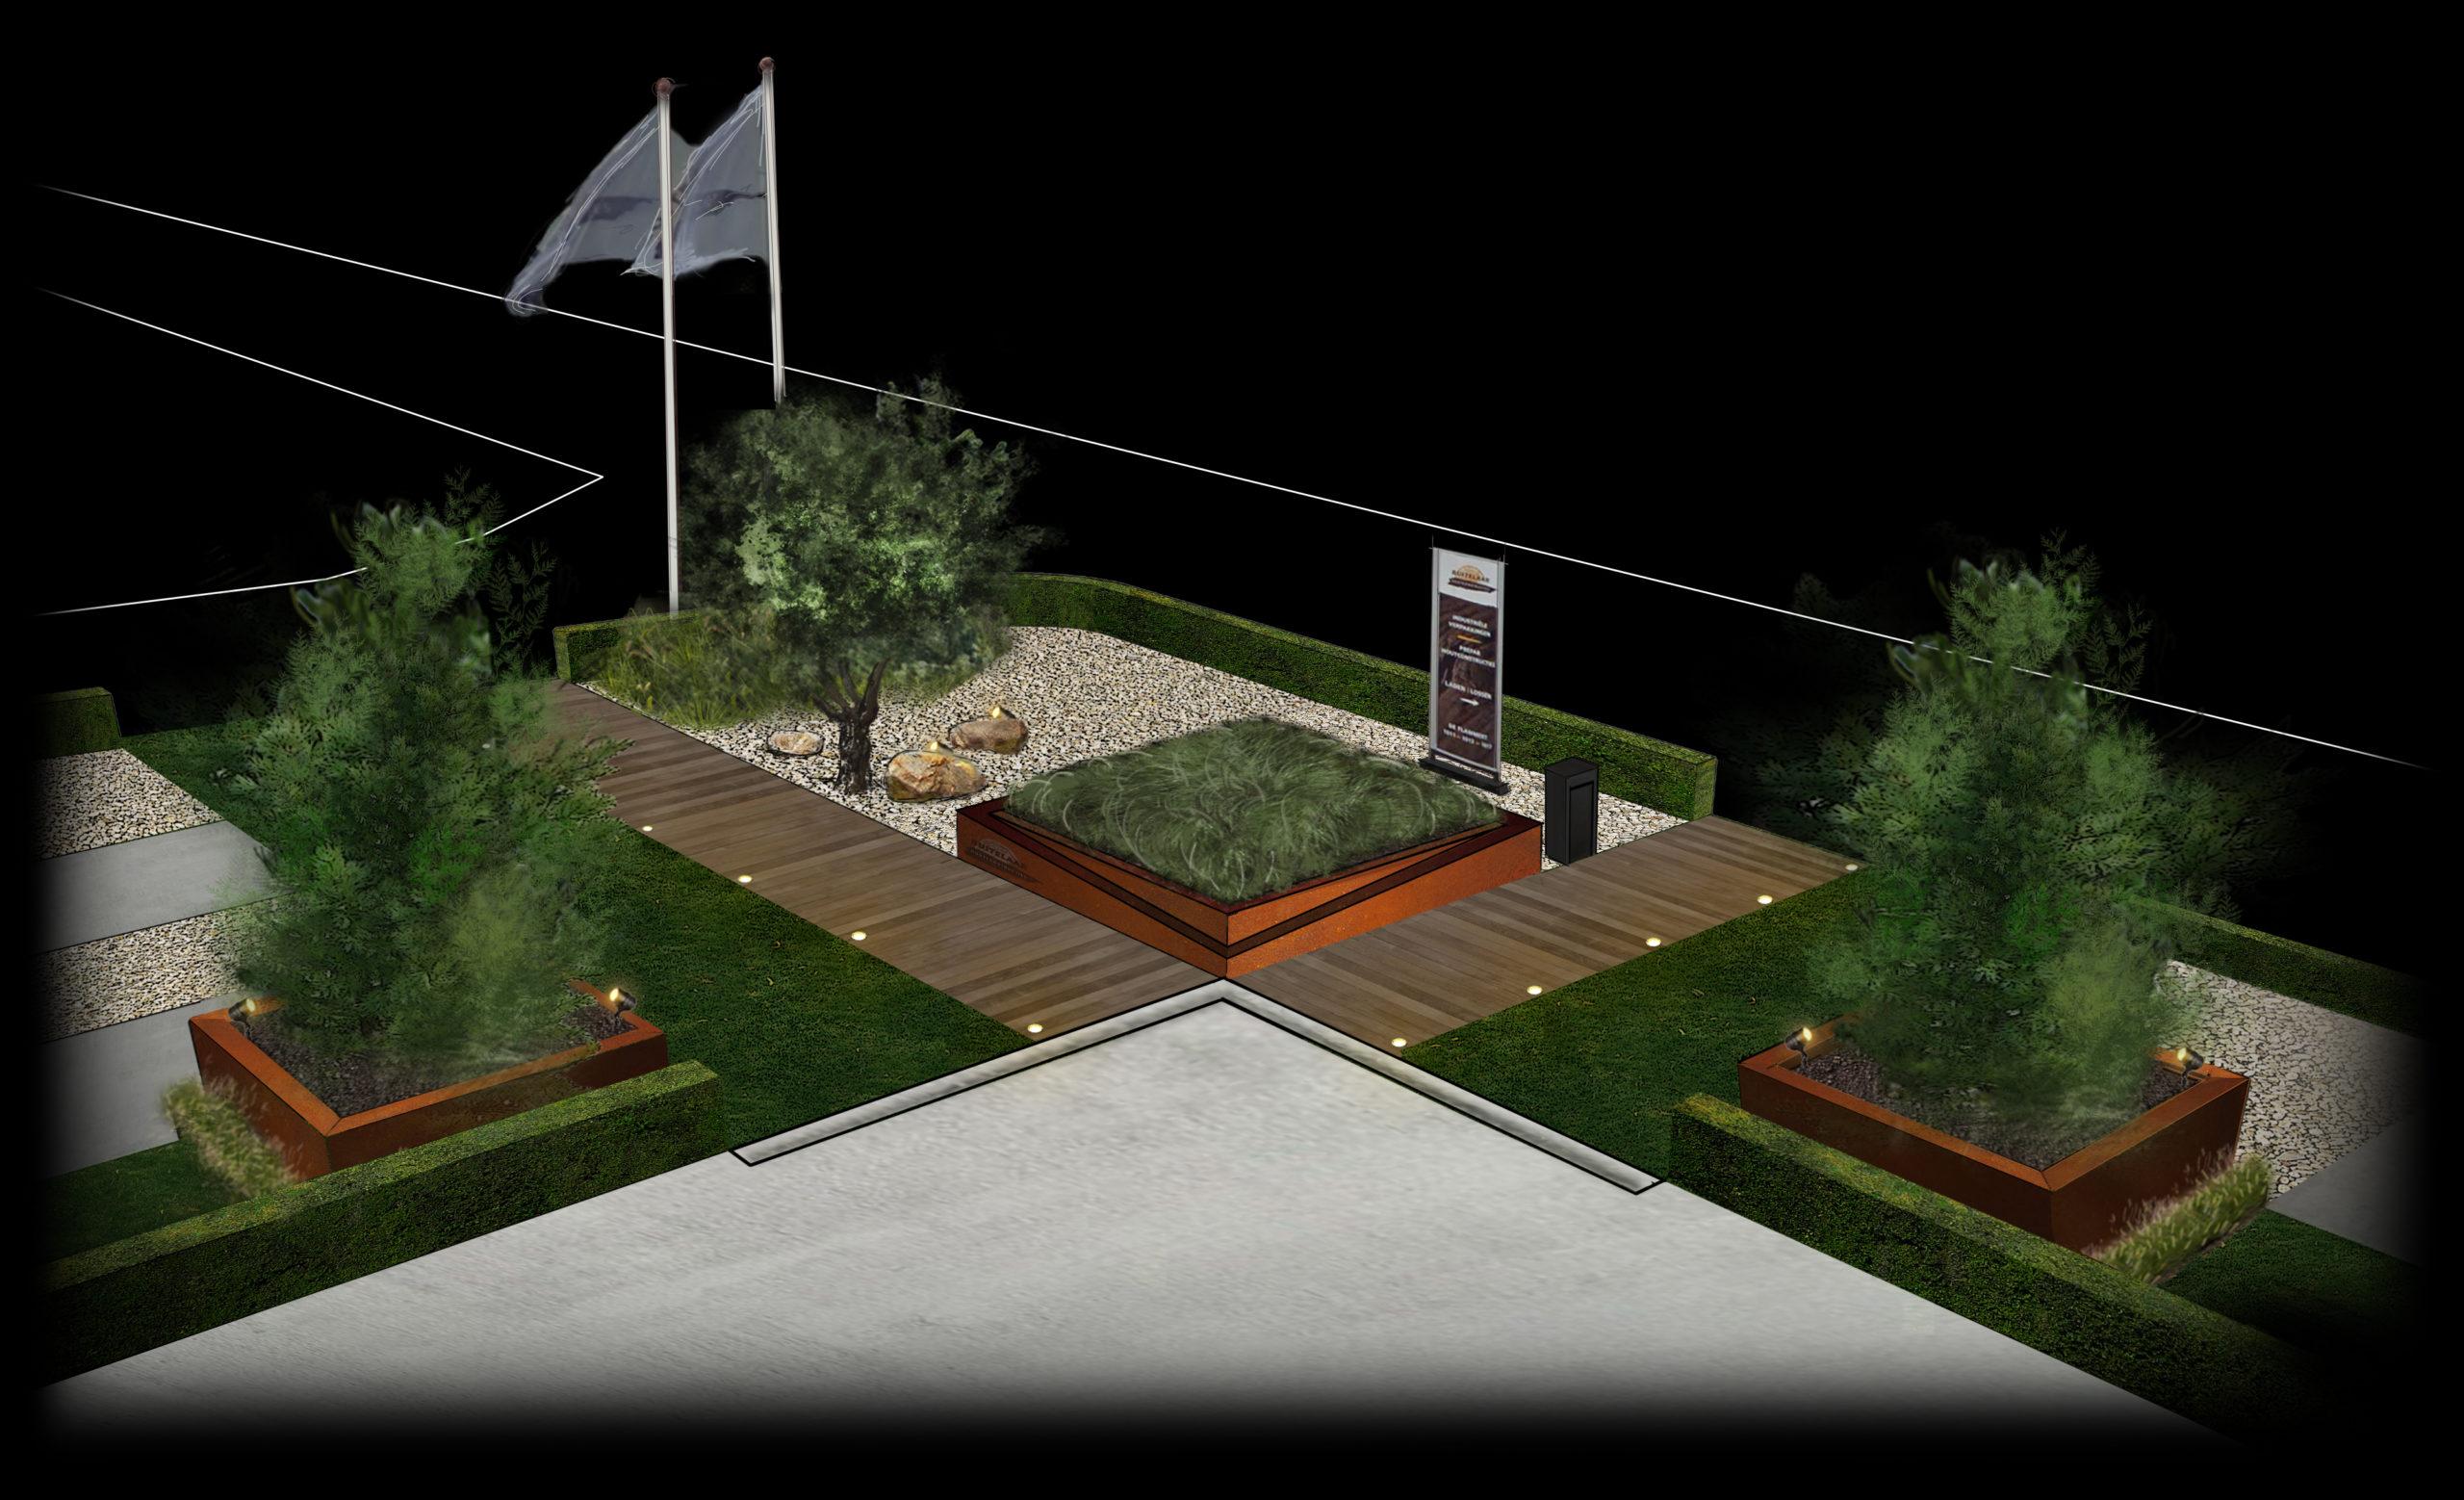 3D impressie tuinontwerp houtbouwer hovenier tuinaanleg tuininspiratie